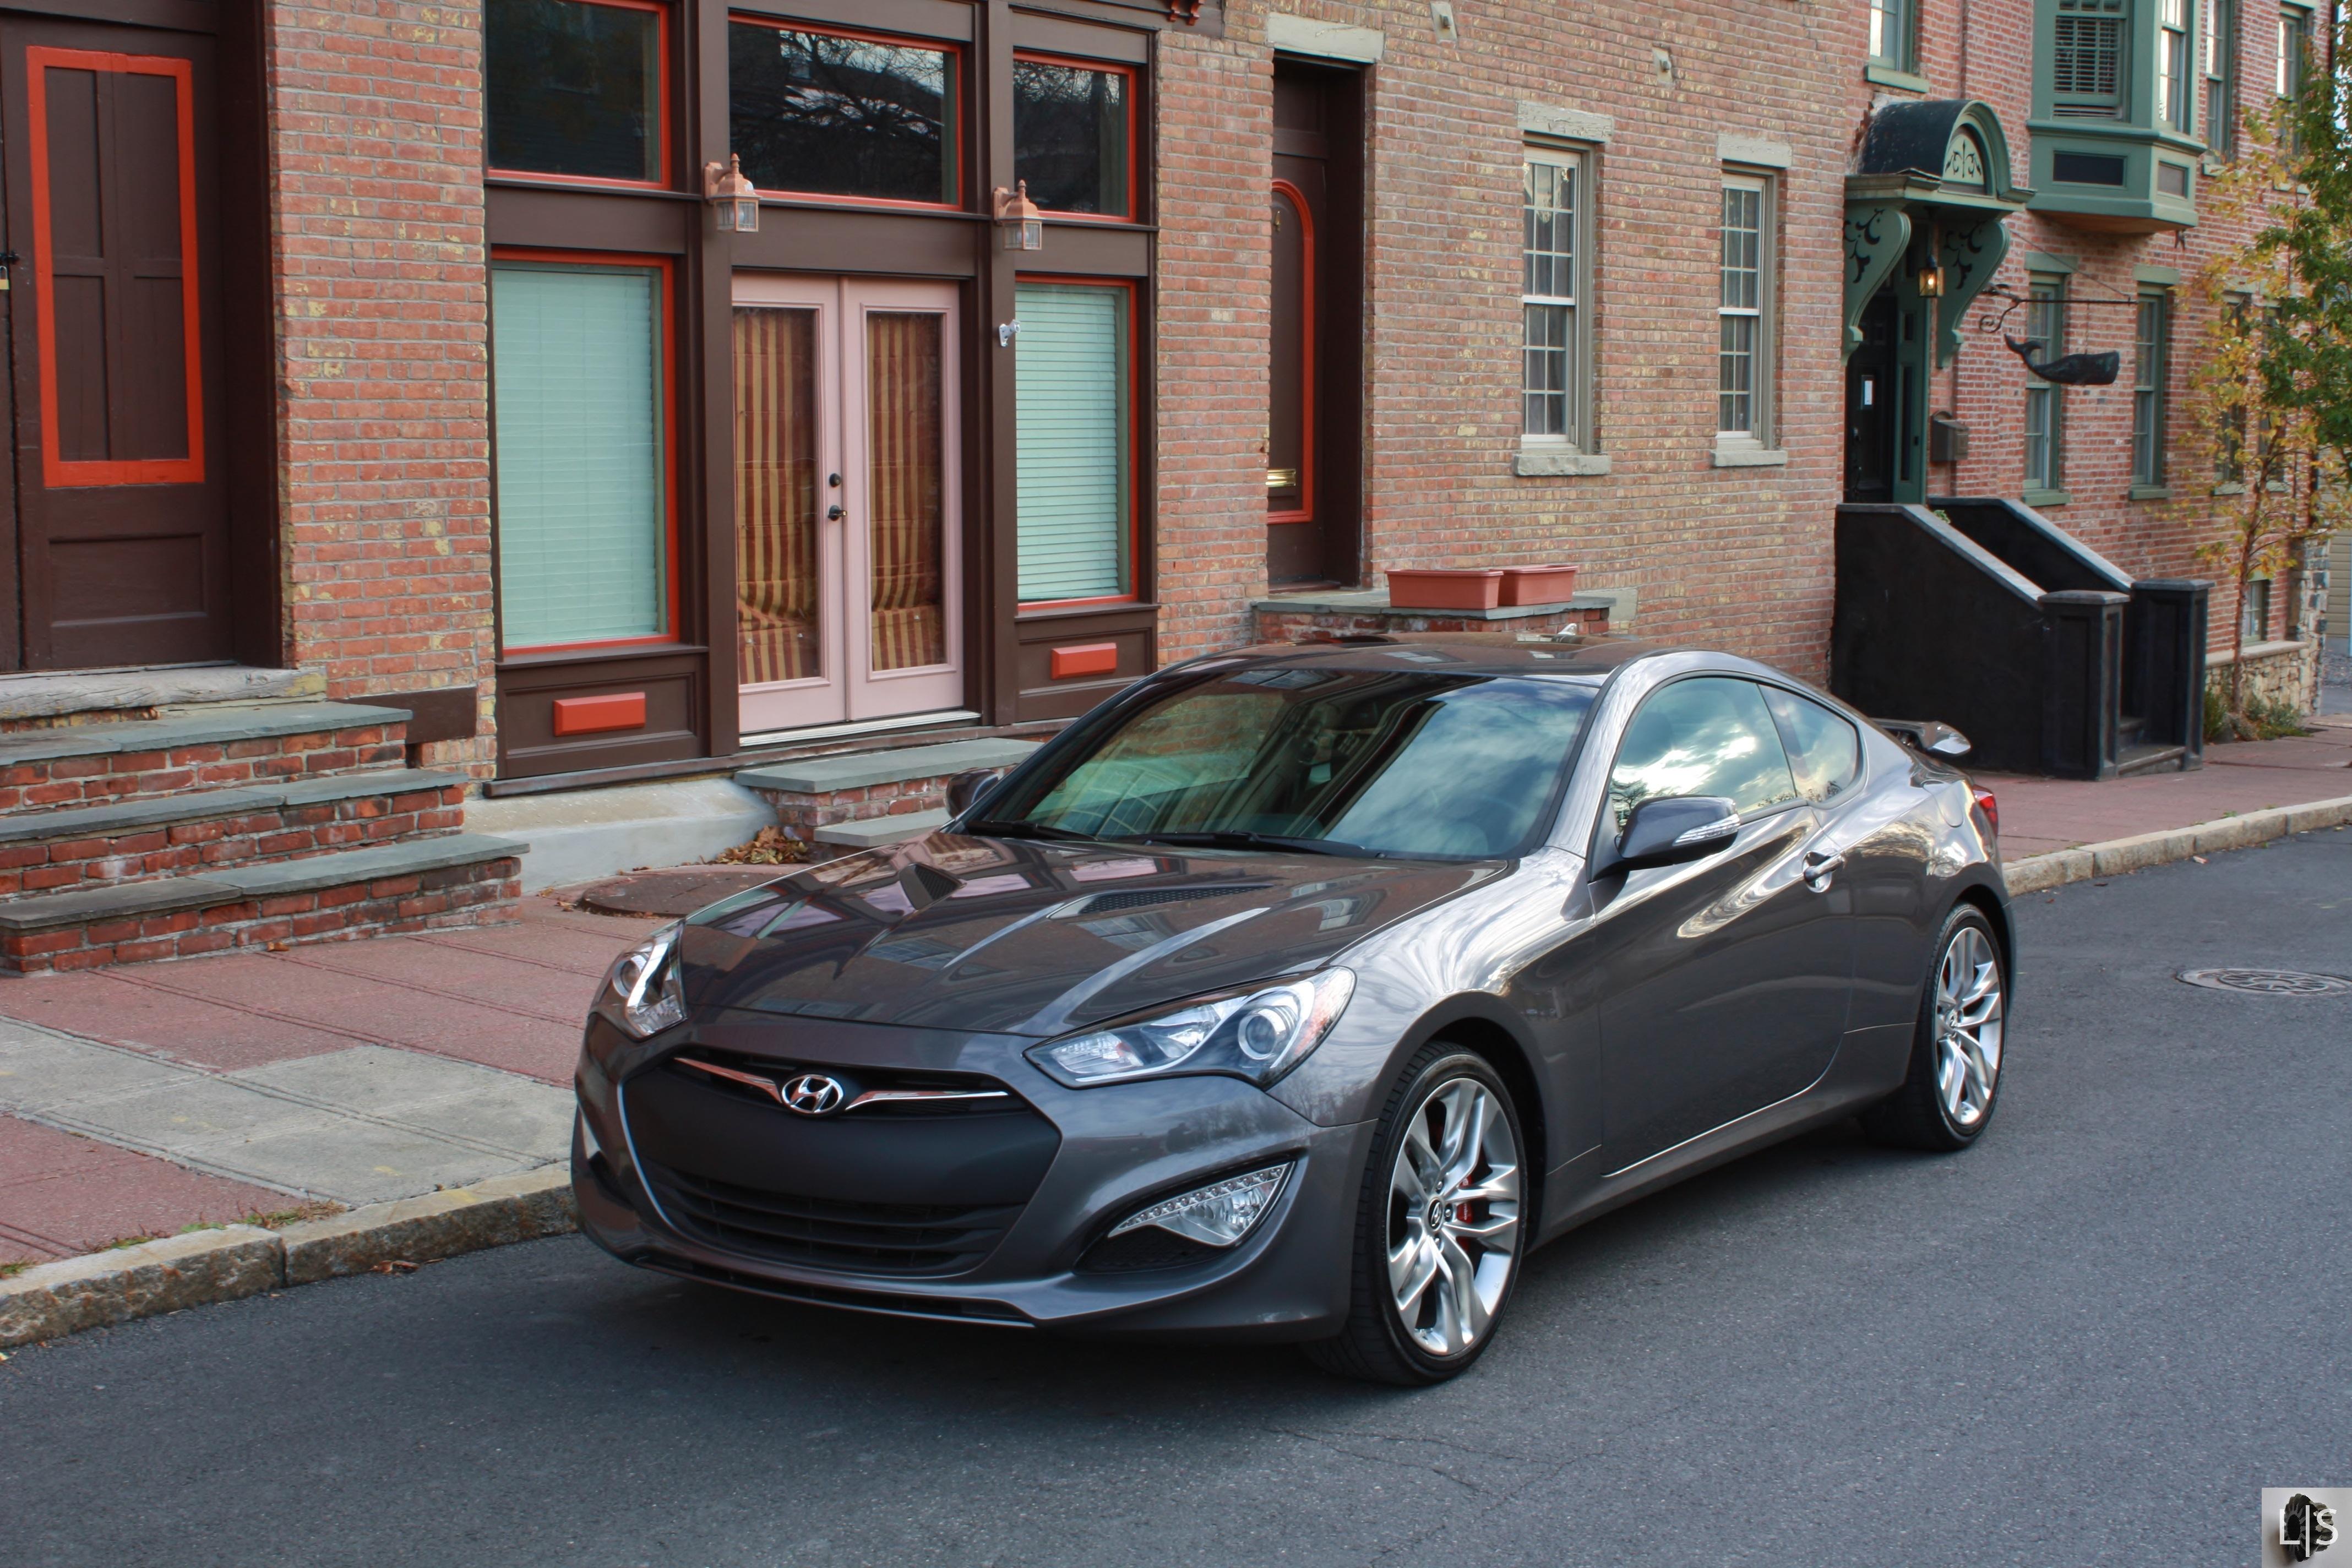 2013 hyundai genesis coupe 3 8 track limited slip blog - Hyundai 3 8 genesis coupe ...